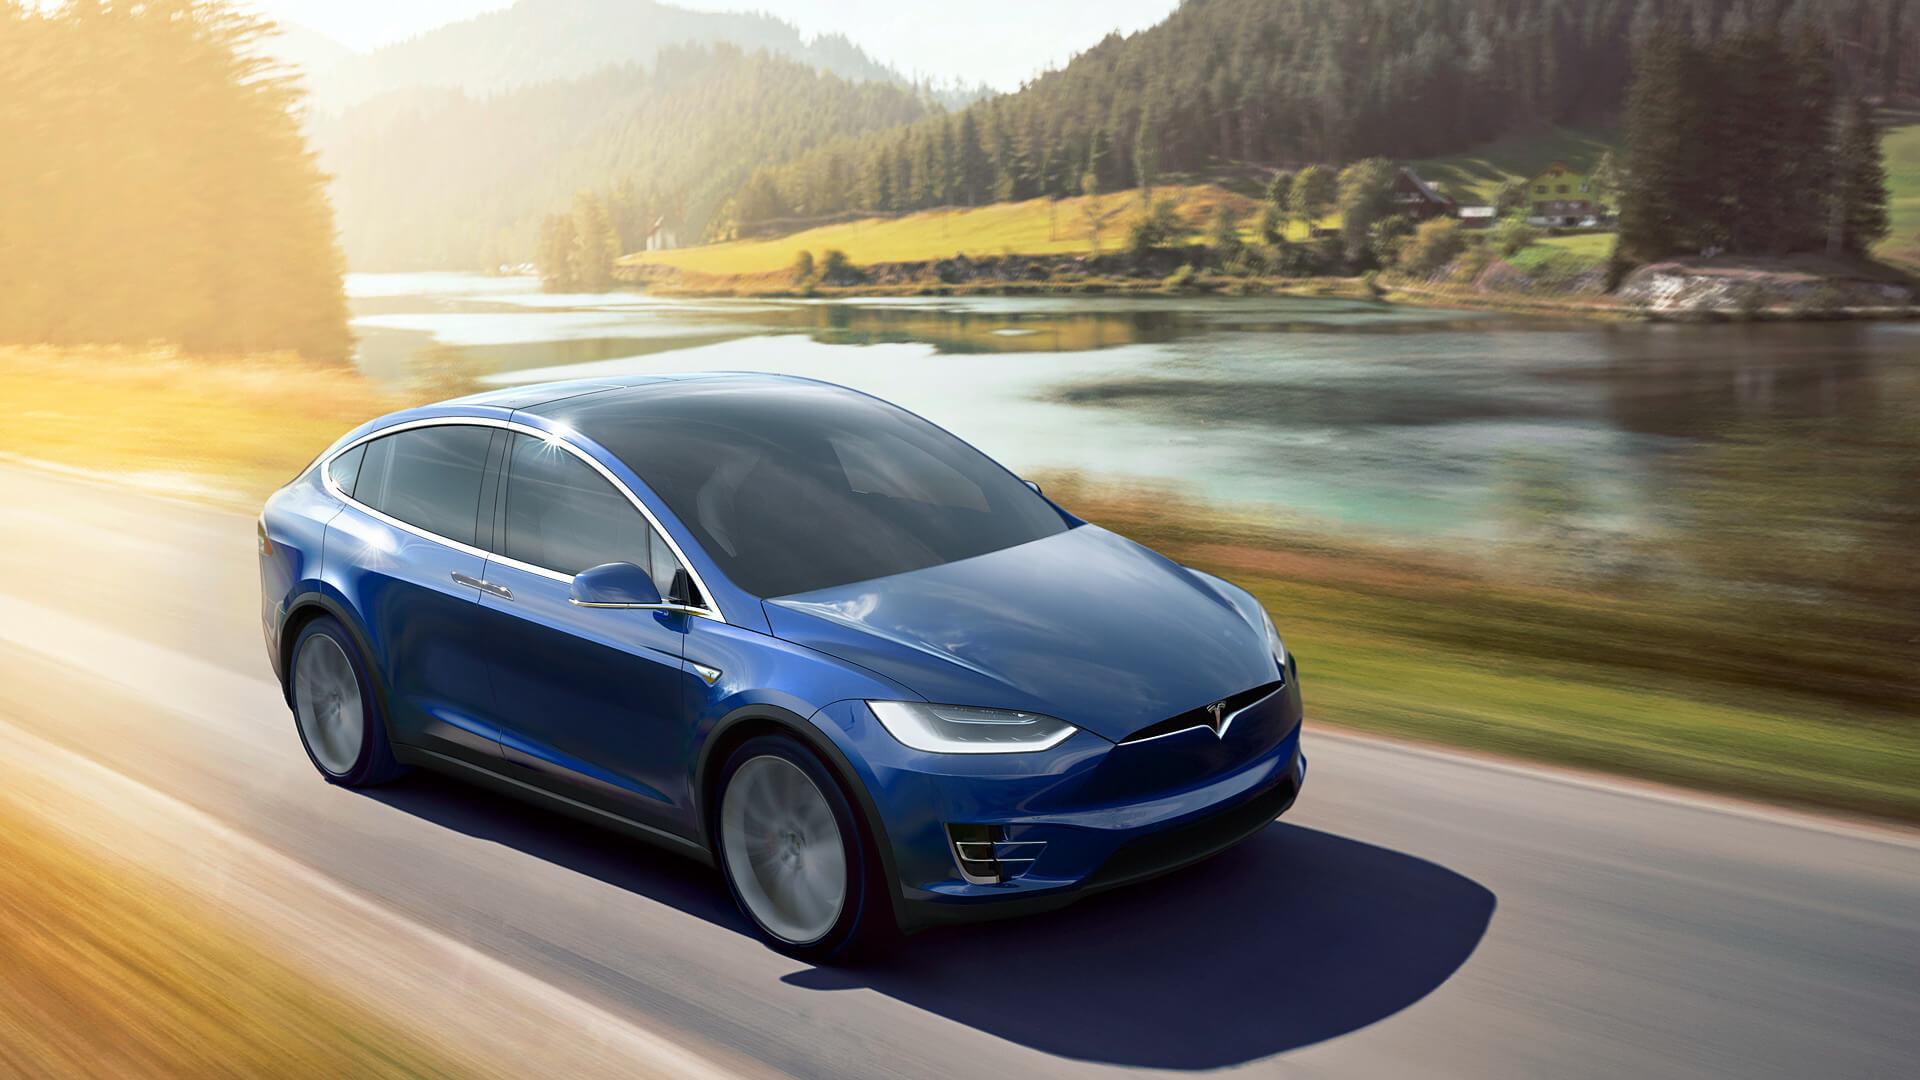 Тест-драйв Tesla Model X 2